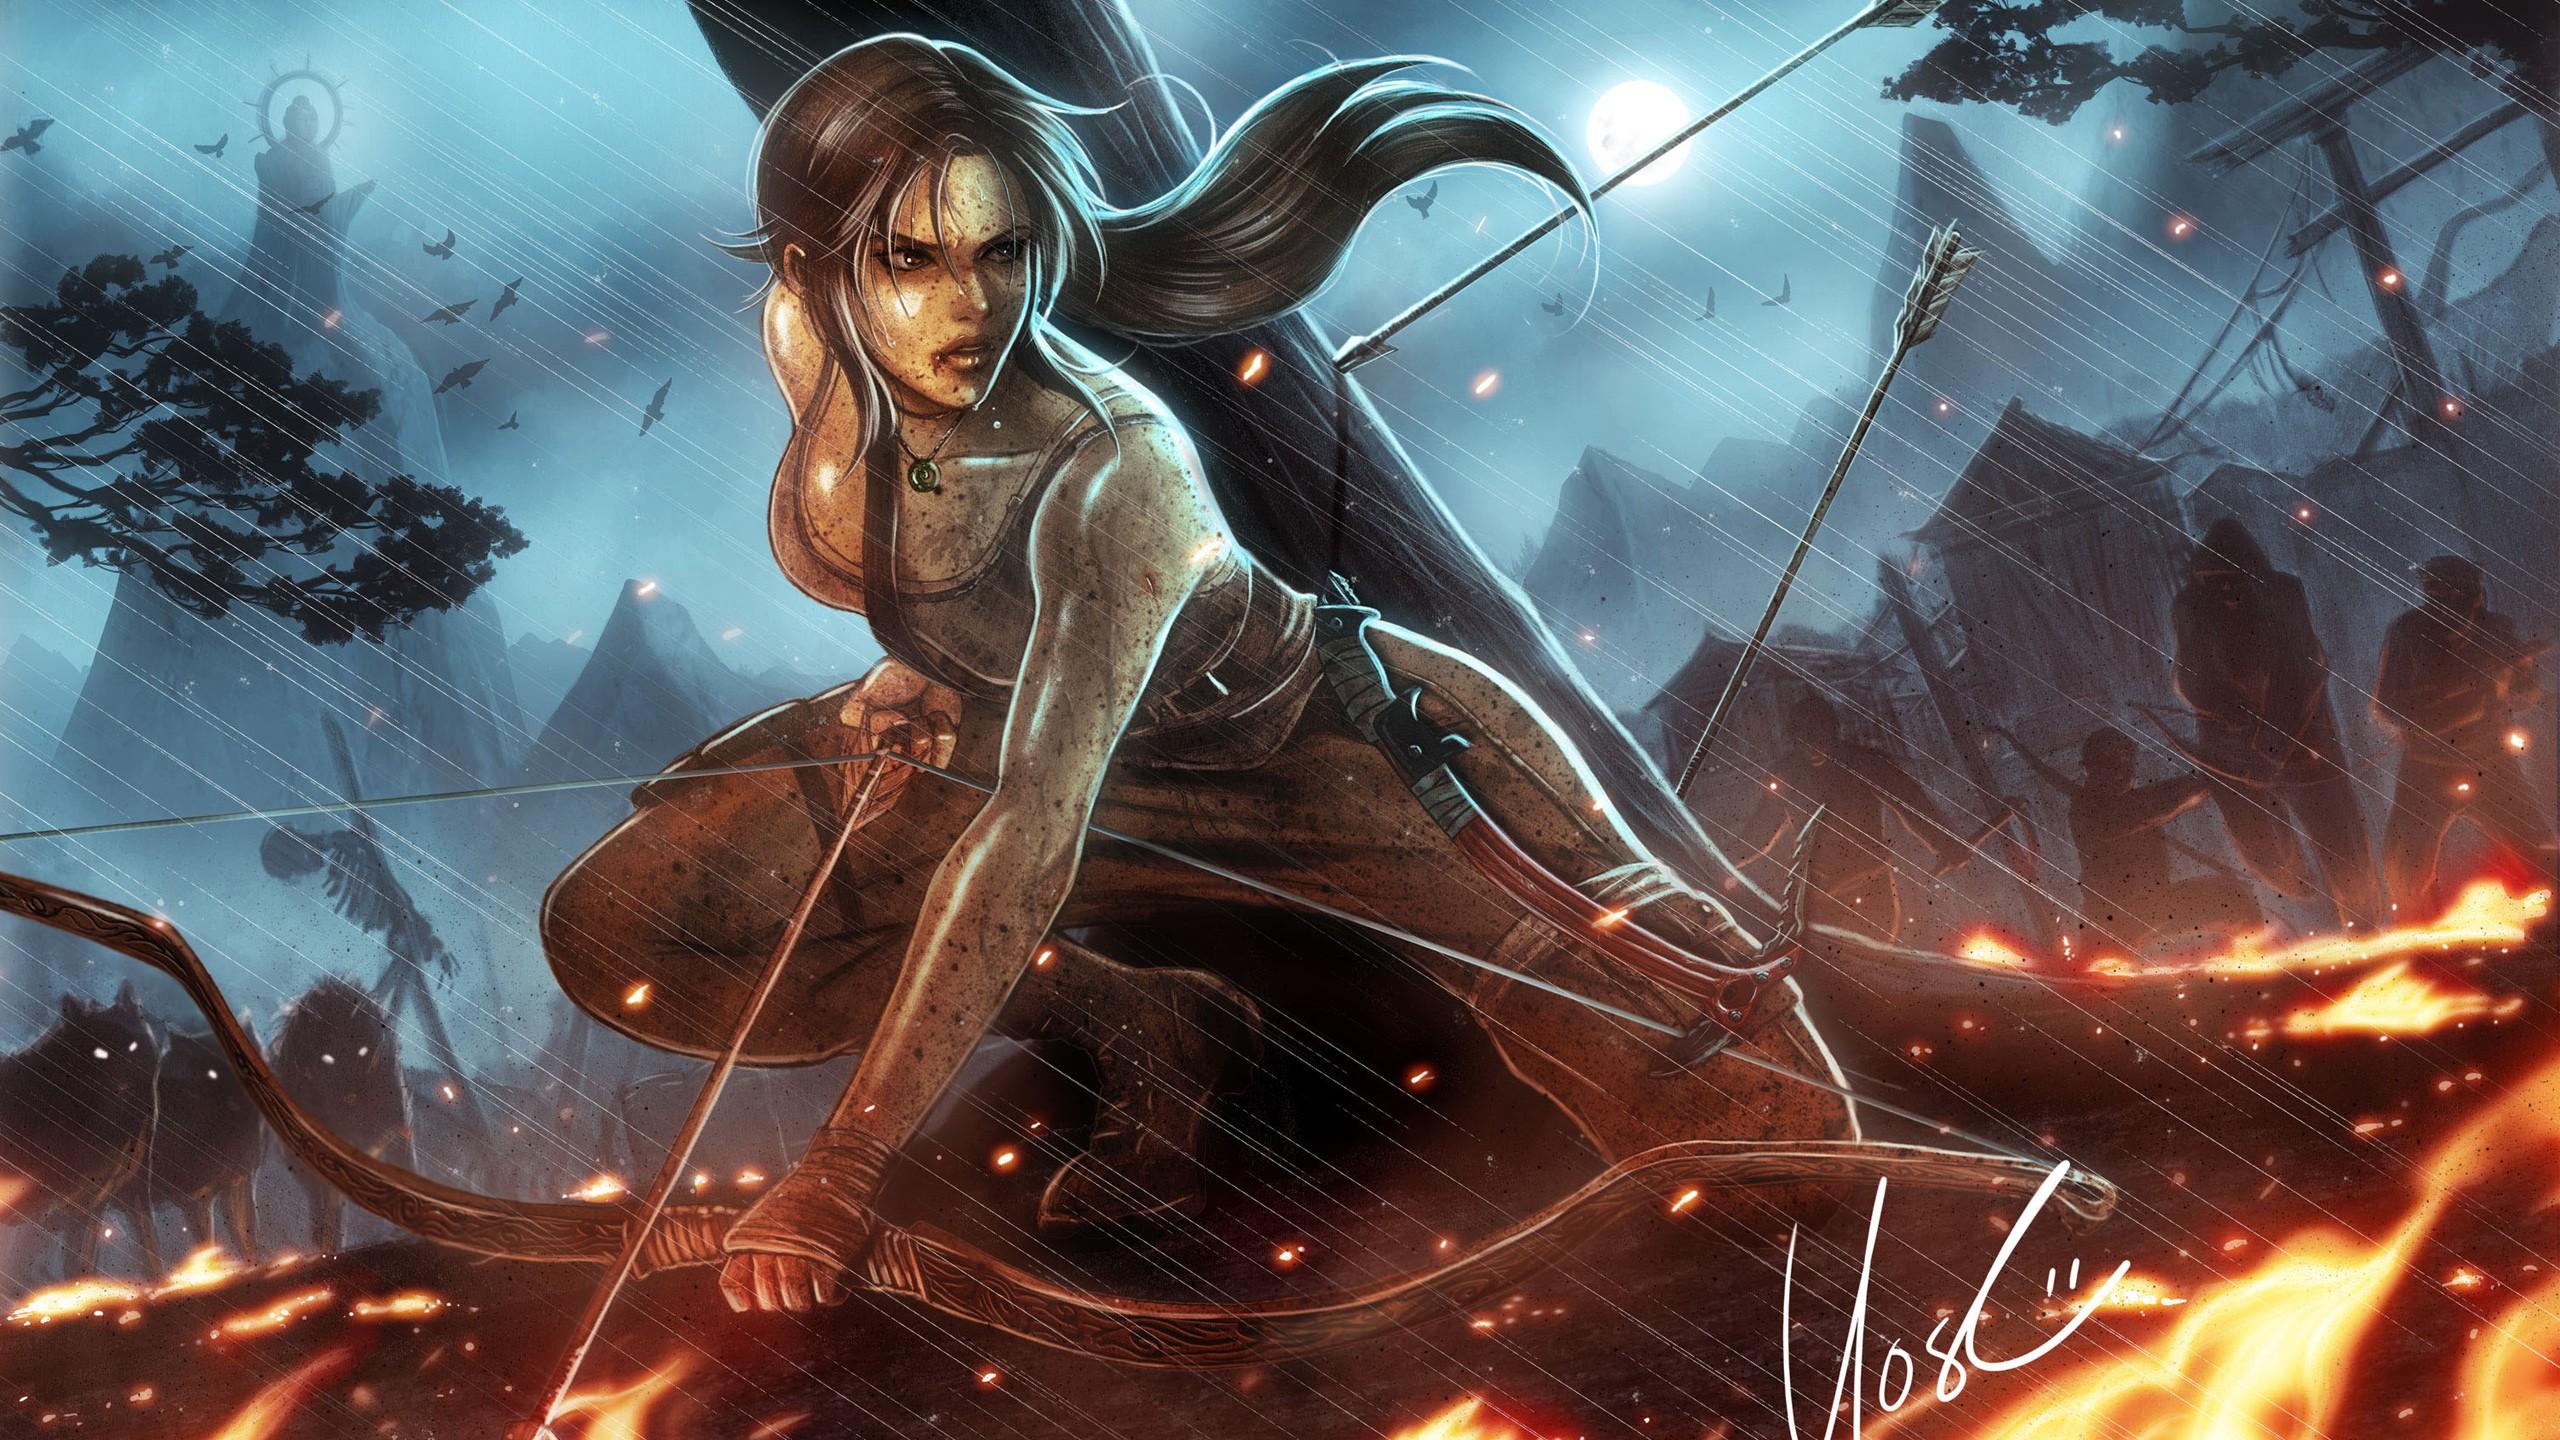 tomb-raider-lara-croft-brunette-bow-arrow-rain